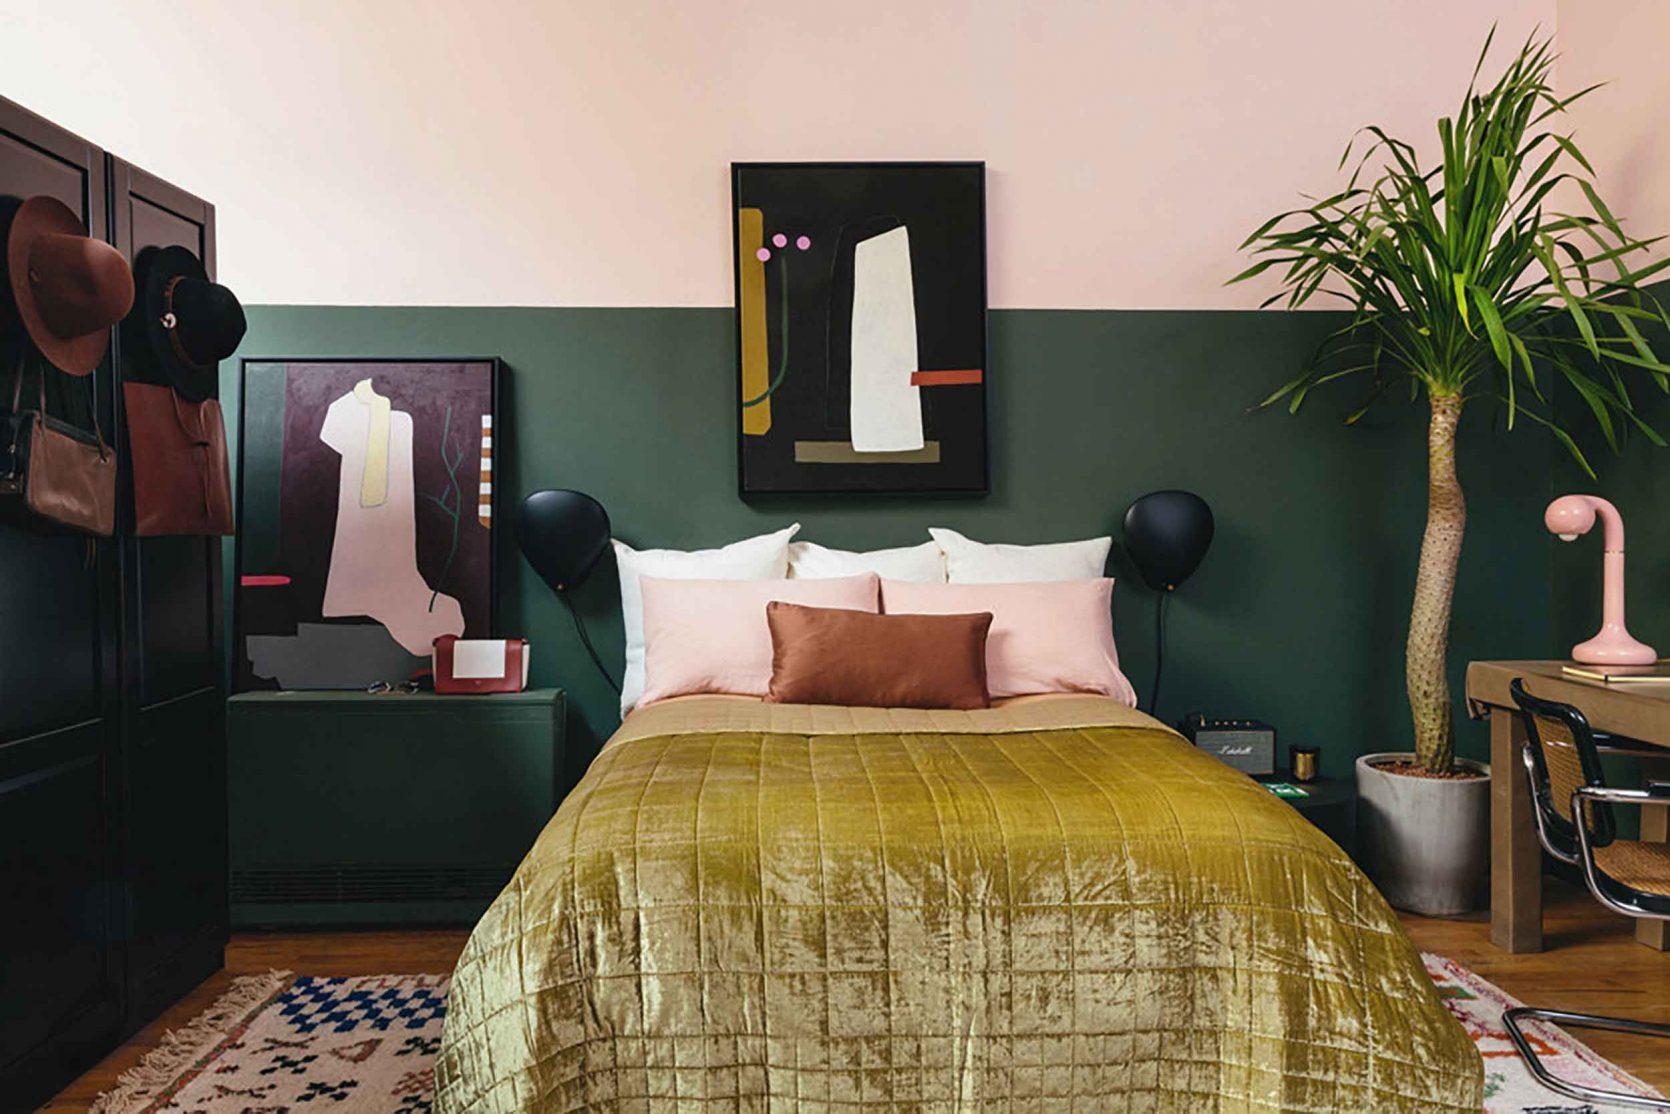 beautiful-ikea-bedroom-furniture-design-minimalist-style-metal-frame-headboard-awesome-a-design-enthusiast-renovating-a-1920s-tudor-home-of-beautiful-ikea-bedroom-furniture-design-minimalist-1670x1114.jpg